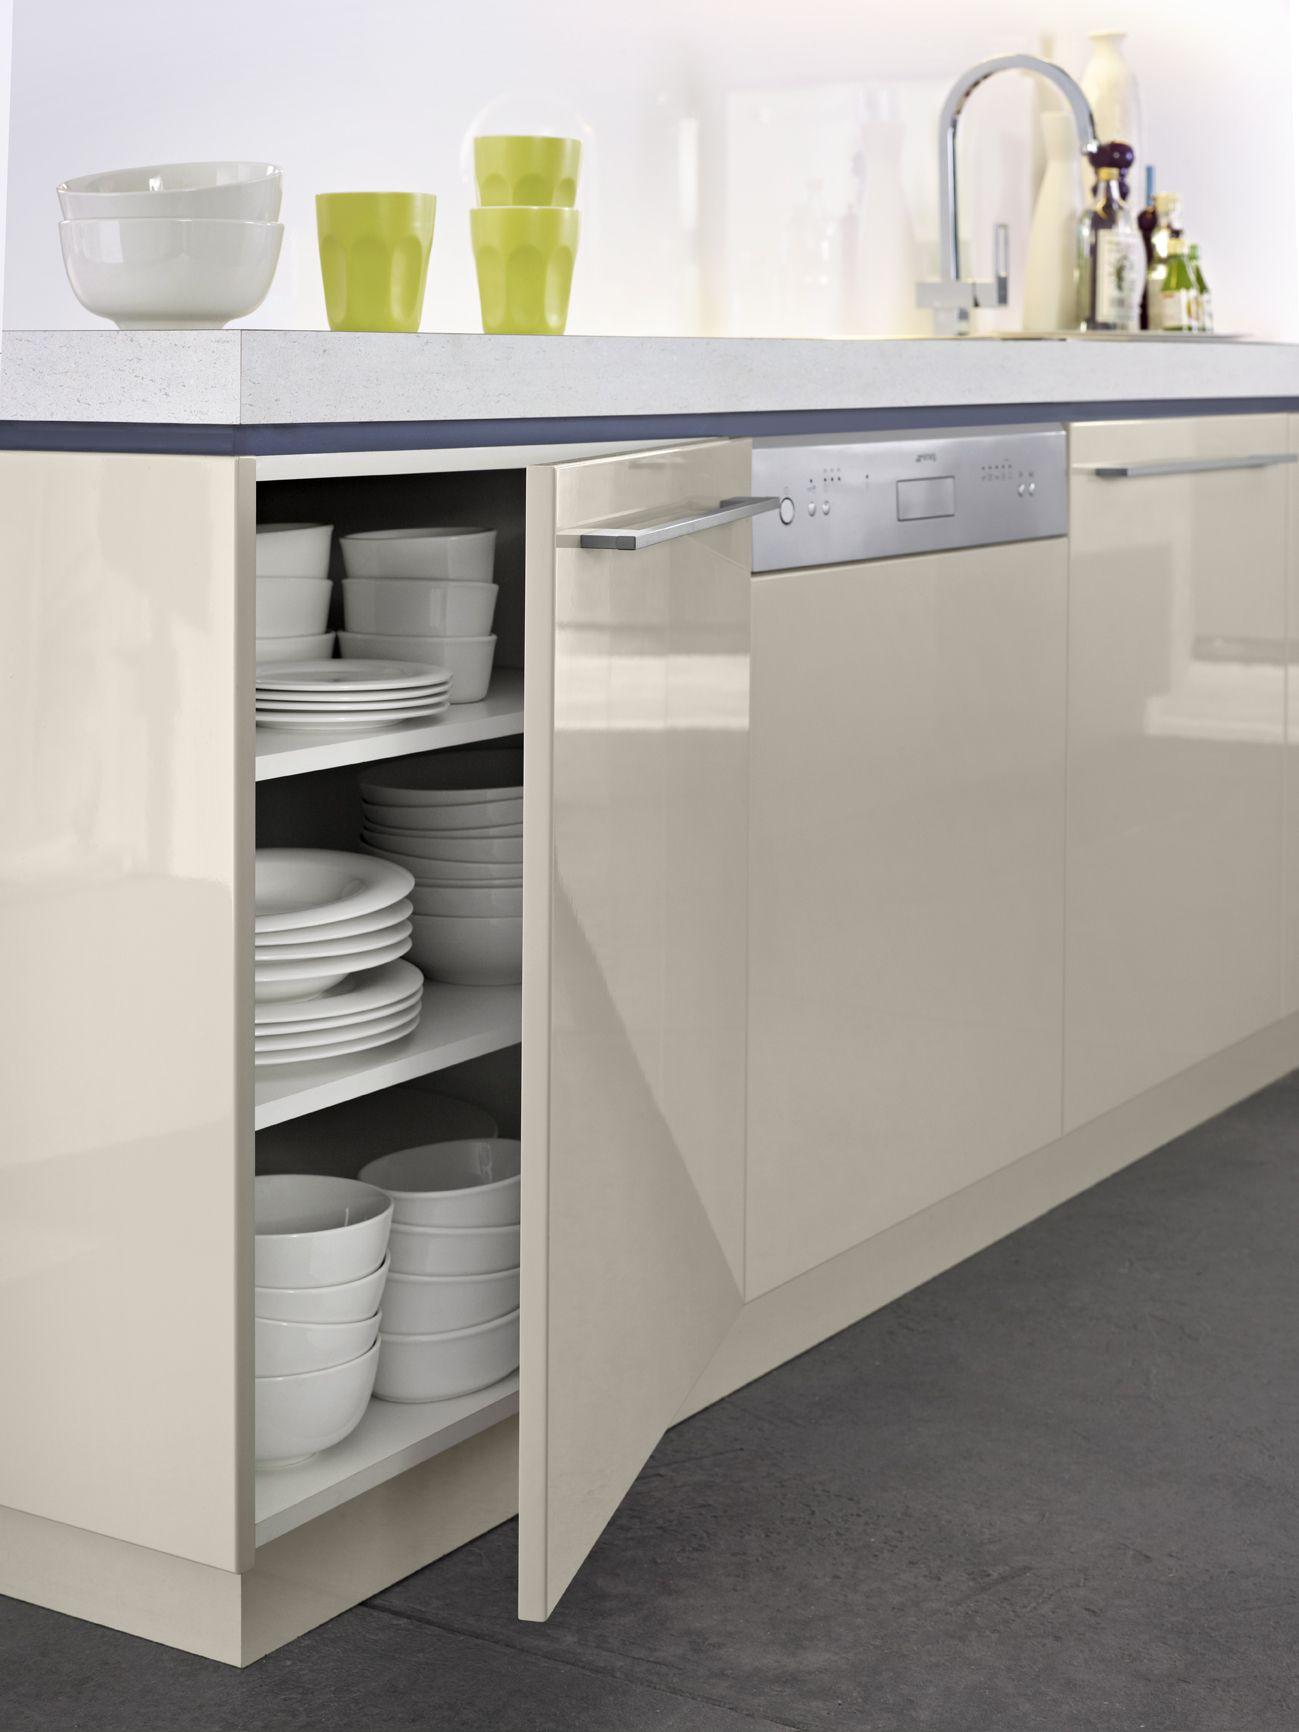 Cupboards laminex colourtech pumice benchtop laminex for Laminex kitchen designs